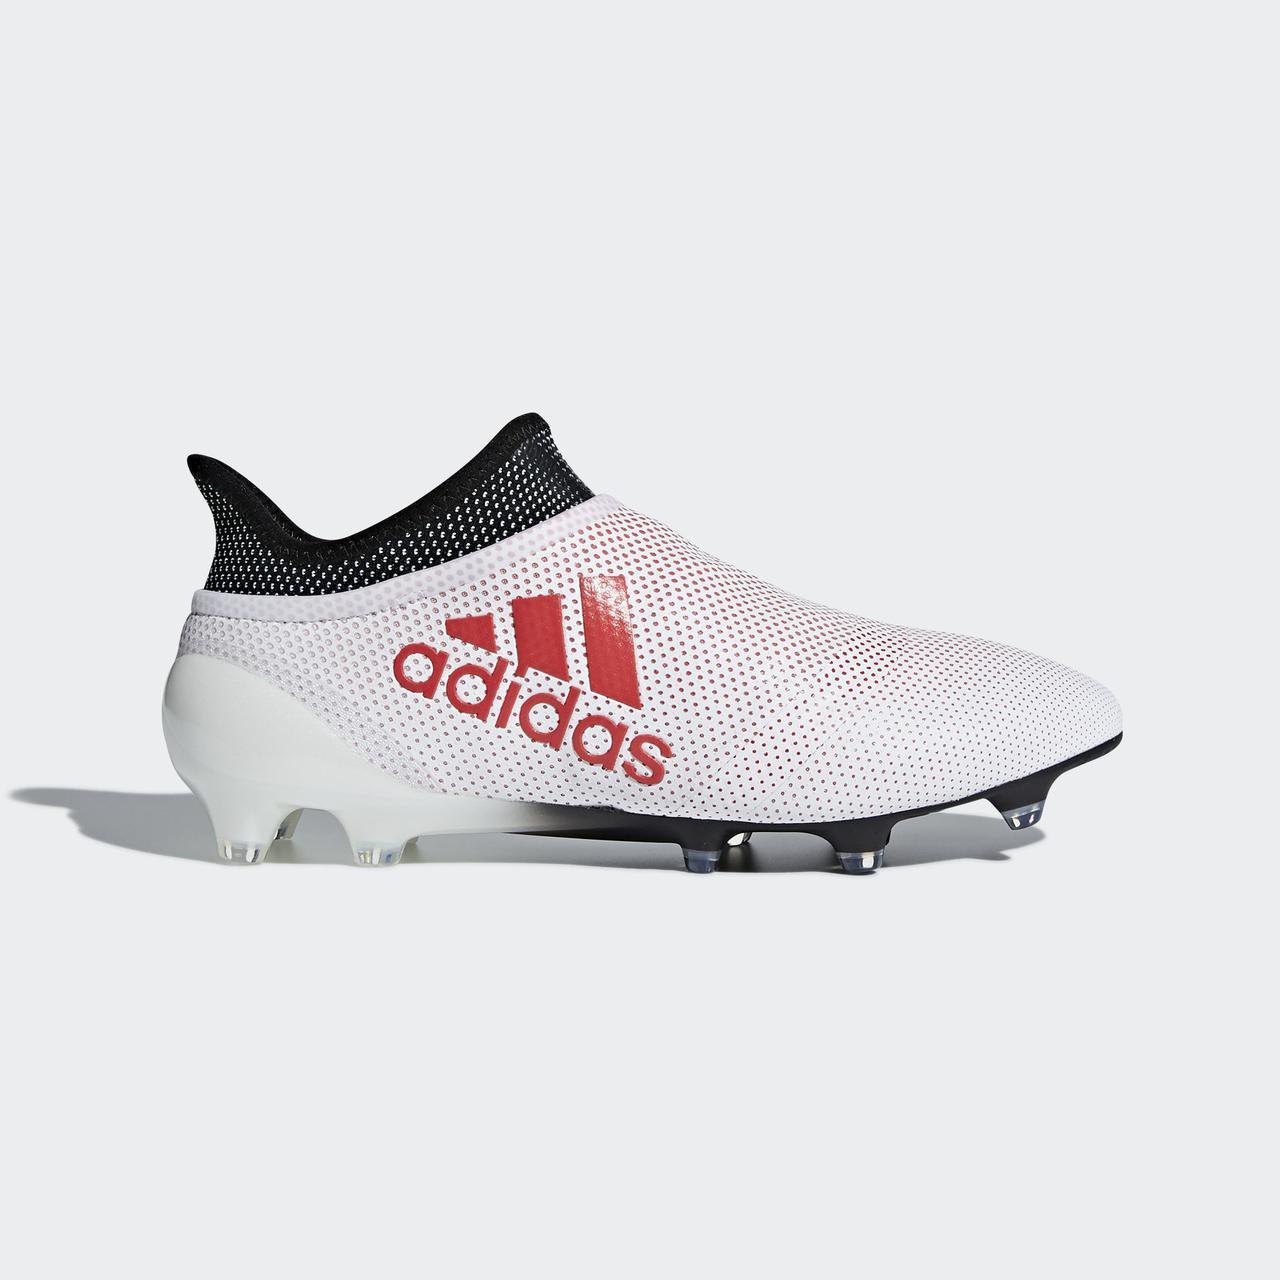 9ed2fa33 Футбольные бутсы Adidas Performance X 17+ Purespeed FG (Артикул: CM7712) -  Интернет